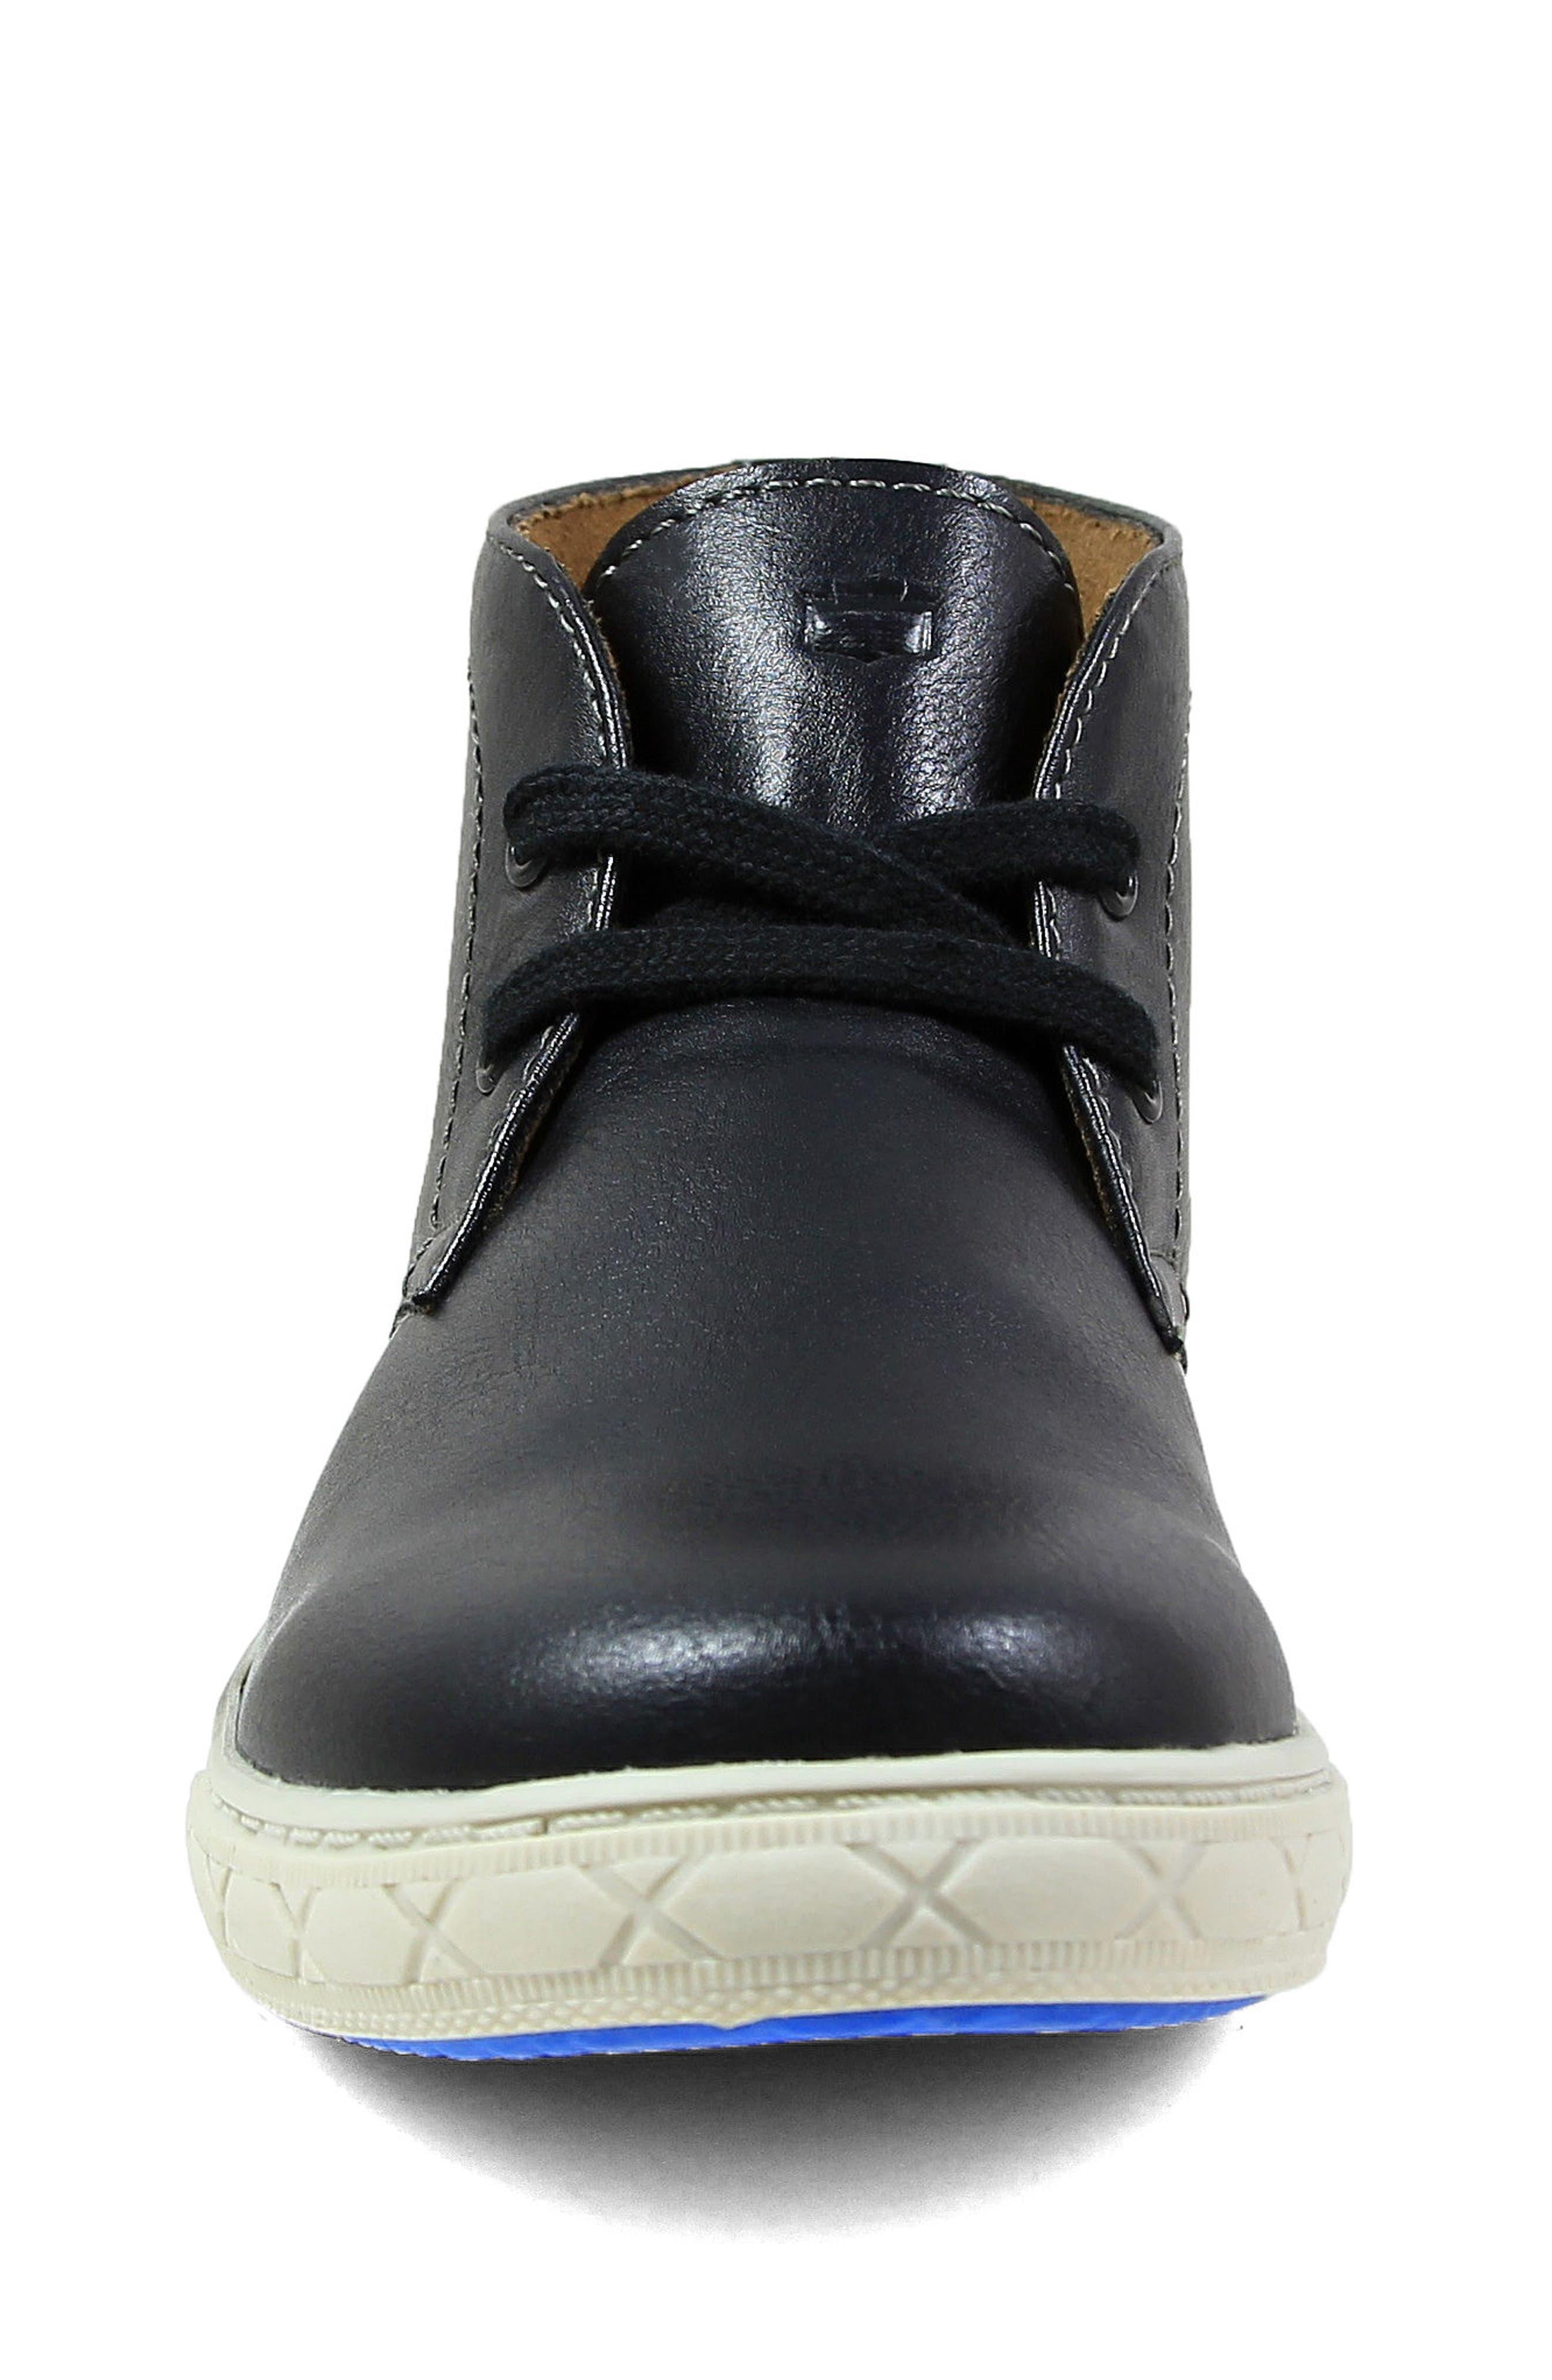 FLORSHEIM, Curb Chukka Sneaker Boot, Alternate thumbnail 3, color, 001